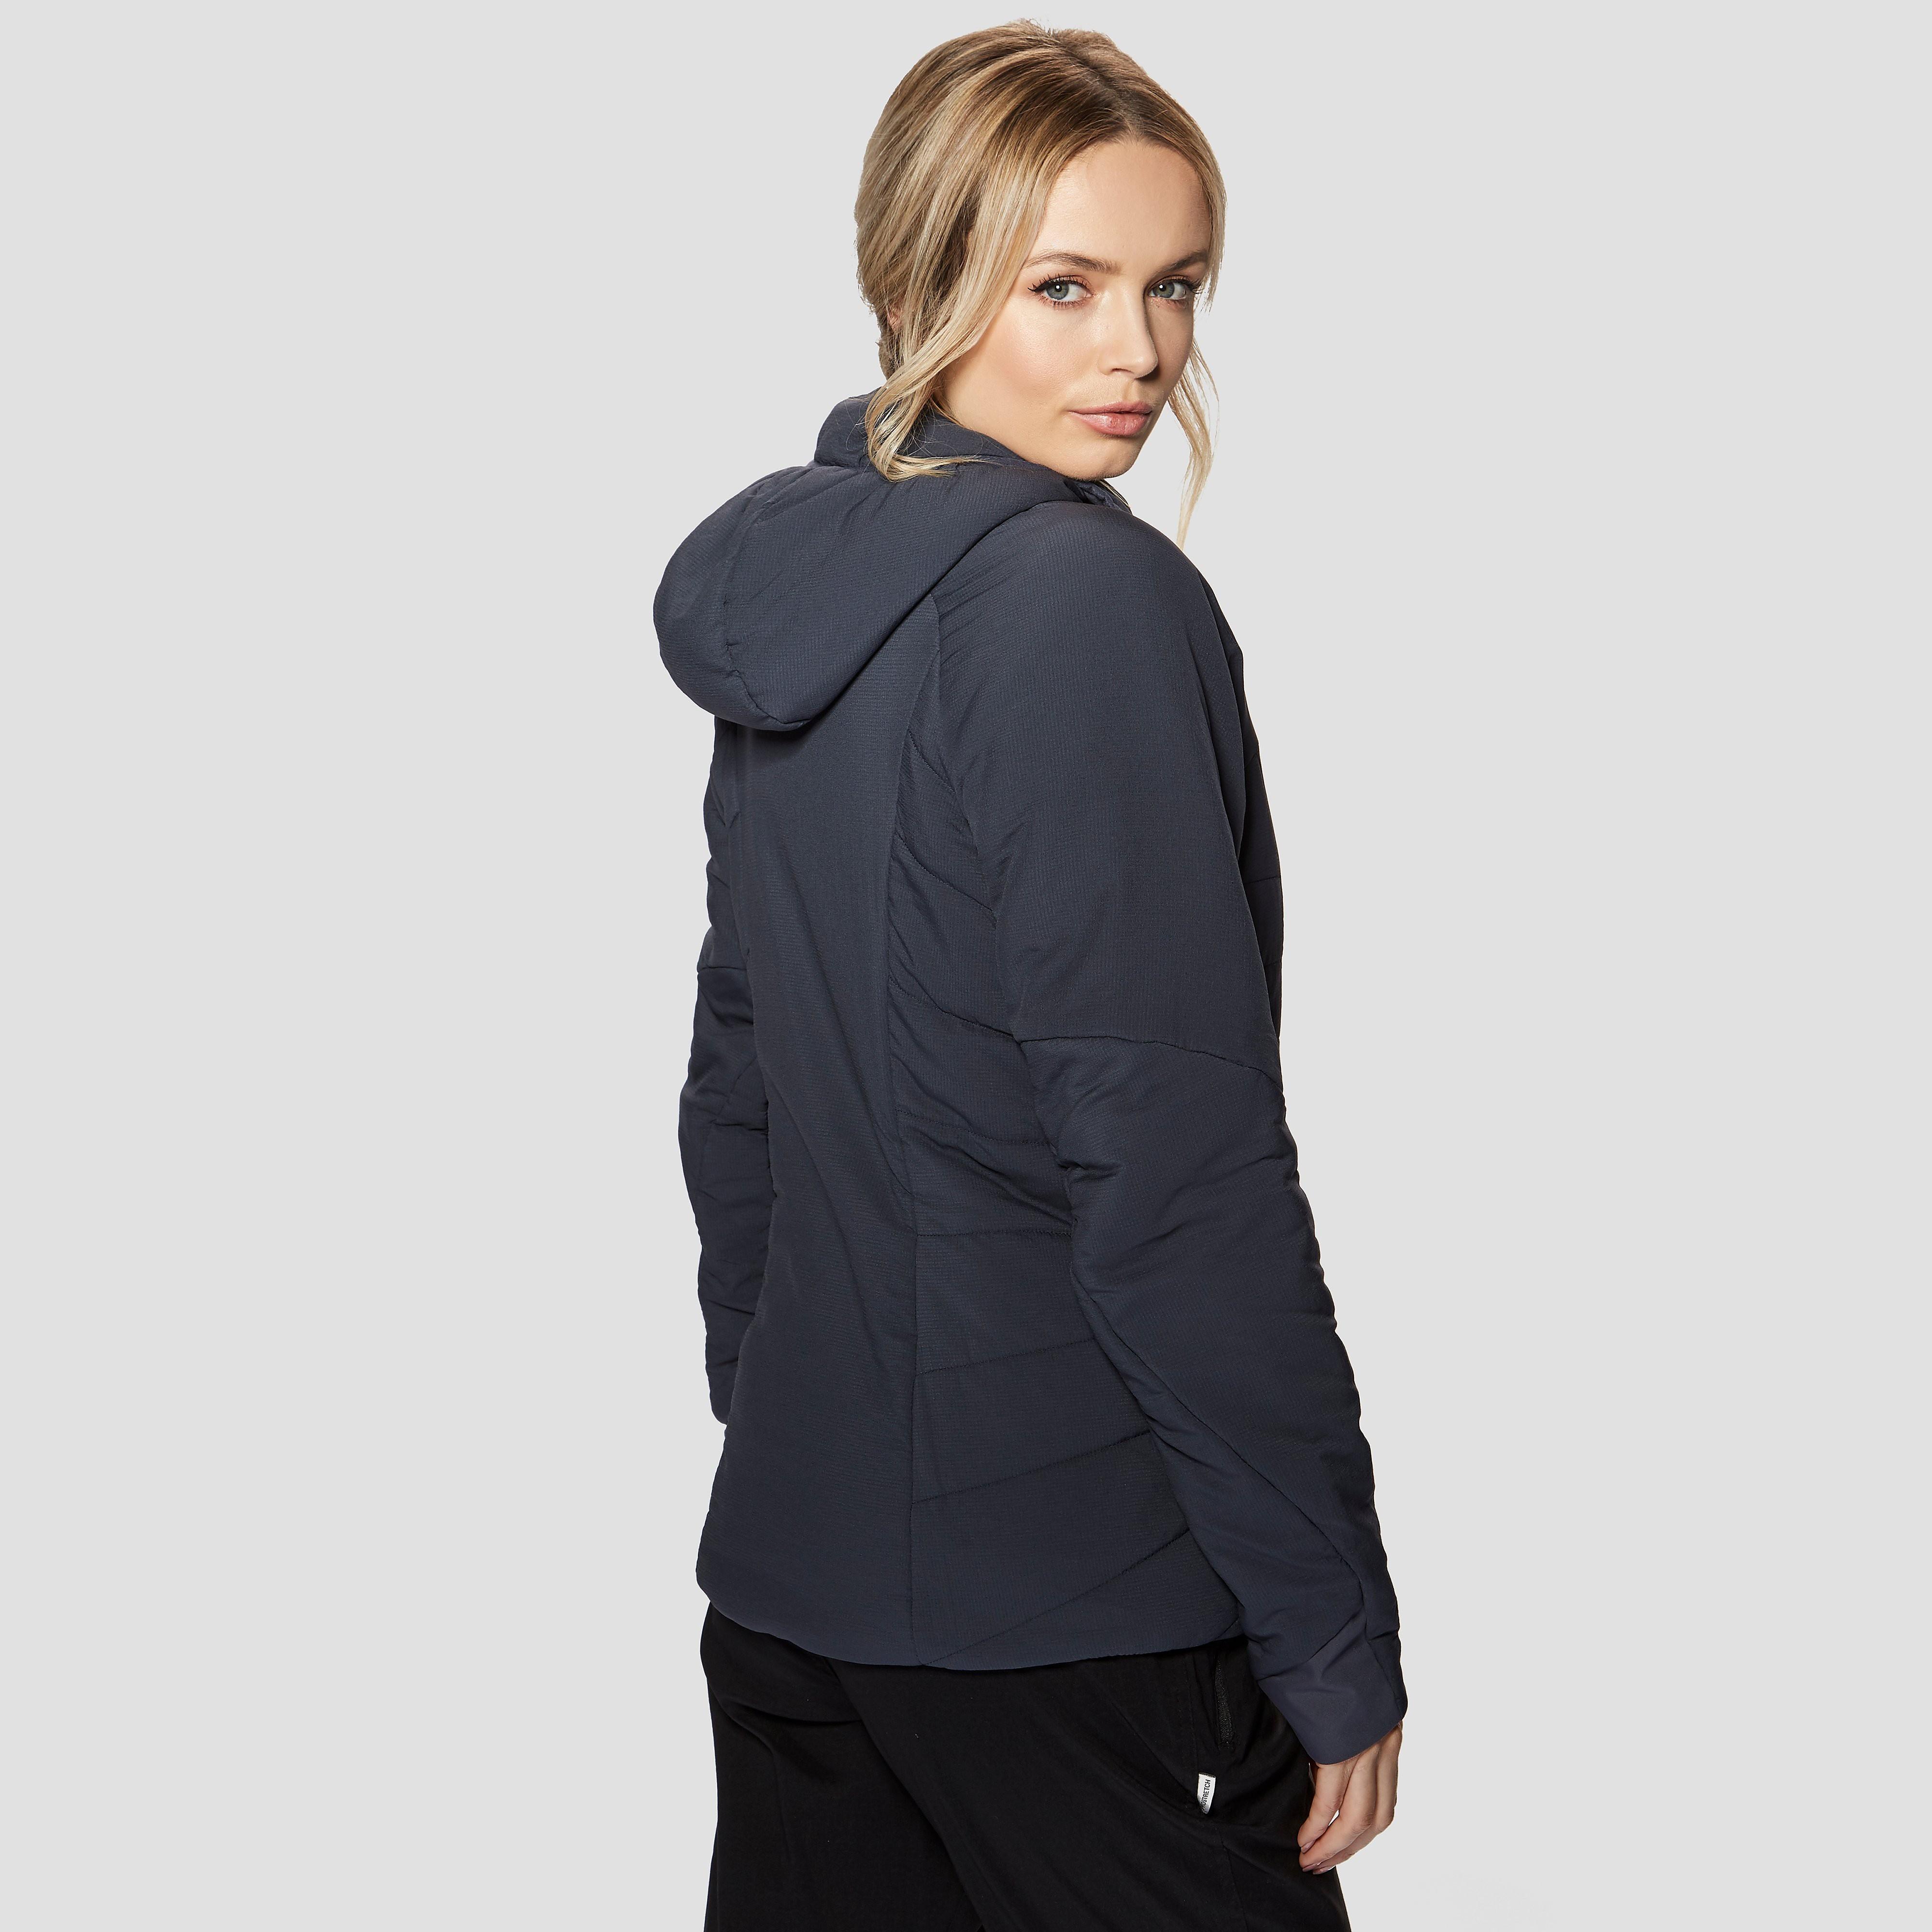 Patagonia Nano-Air Hooded Women's Jacket